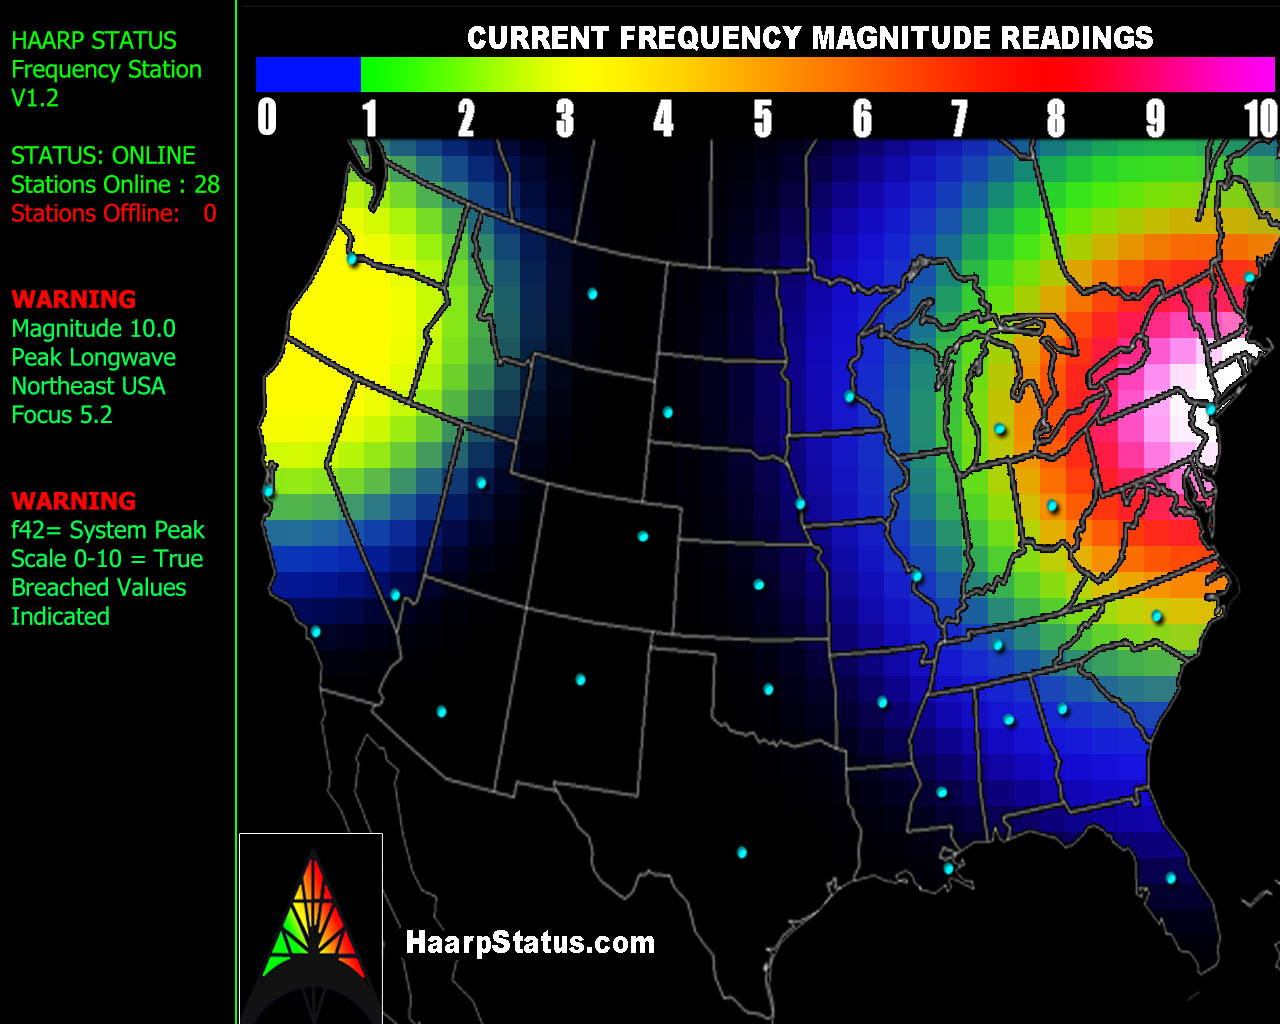 Hurricane Sandy Winter Storm Full Moon Jet Stream The Frankenstormogy And The Haarp